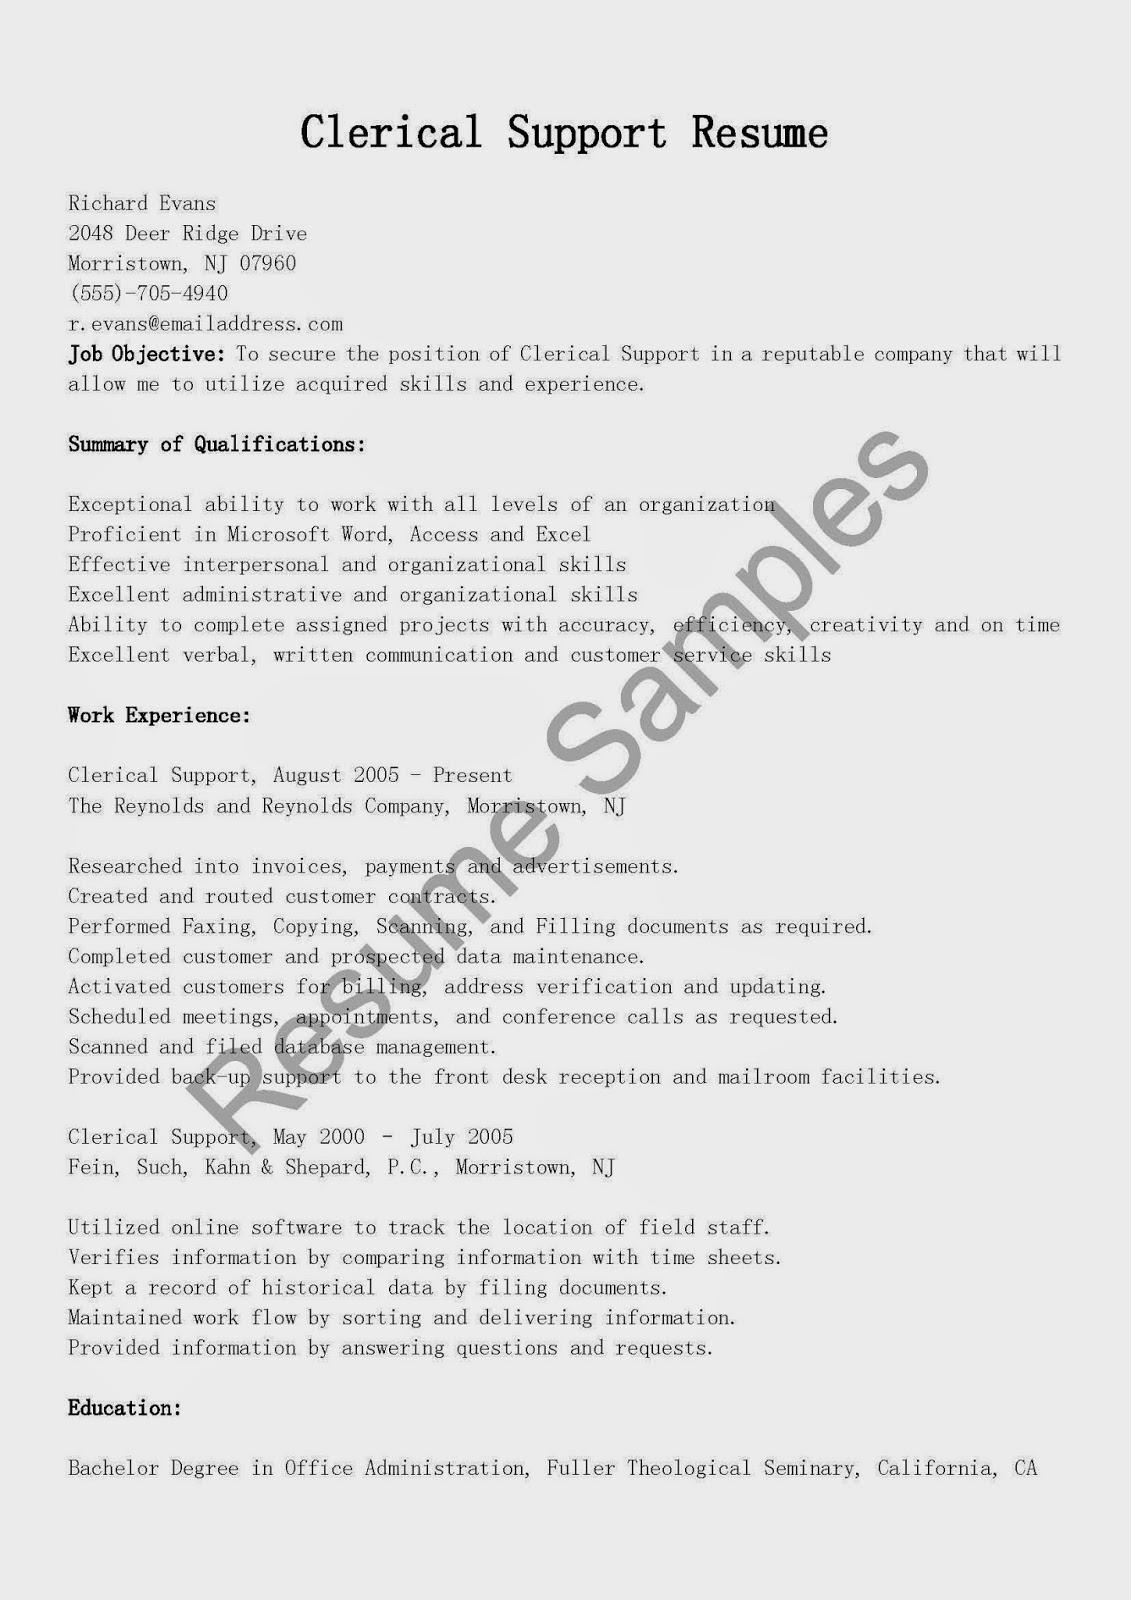 Resume Samples Clerical Support Resume Sample